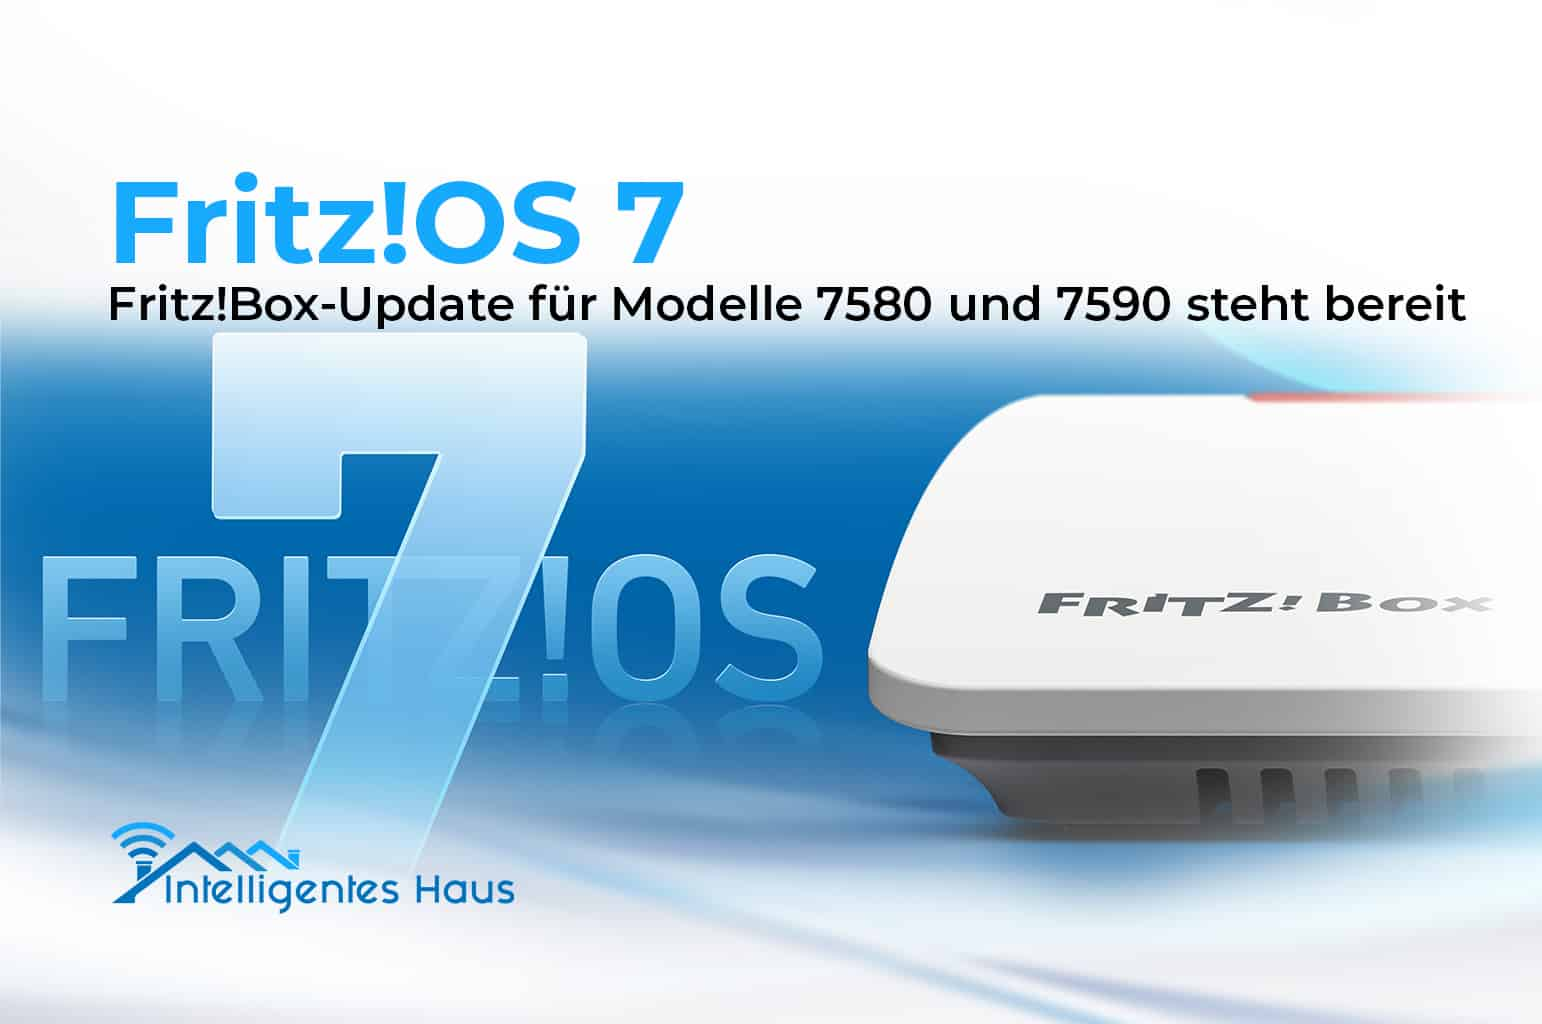 neues firmware update fritz os 7 steht f r zwei fritz box modelle bereit. Black Bedroom Furniture Sets. Home Design Ideas